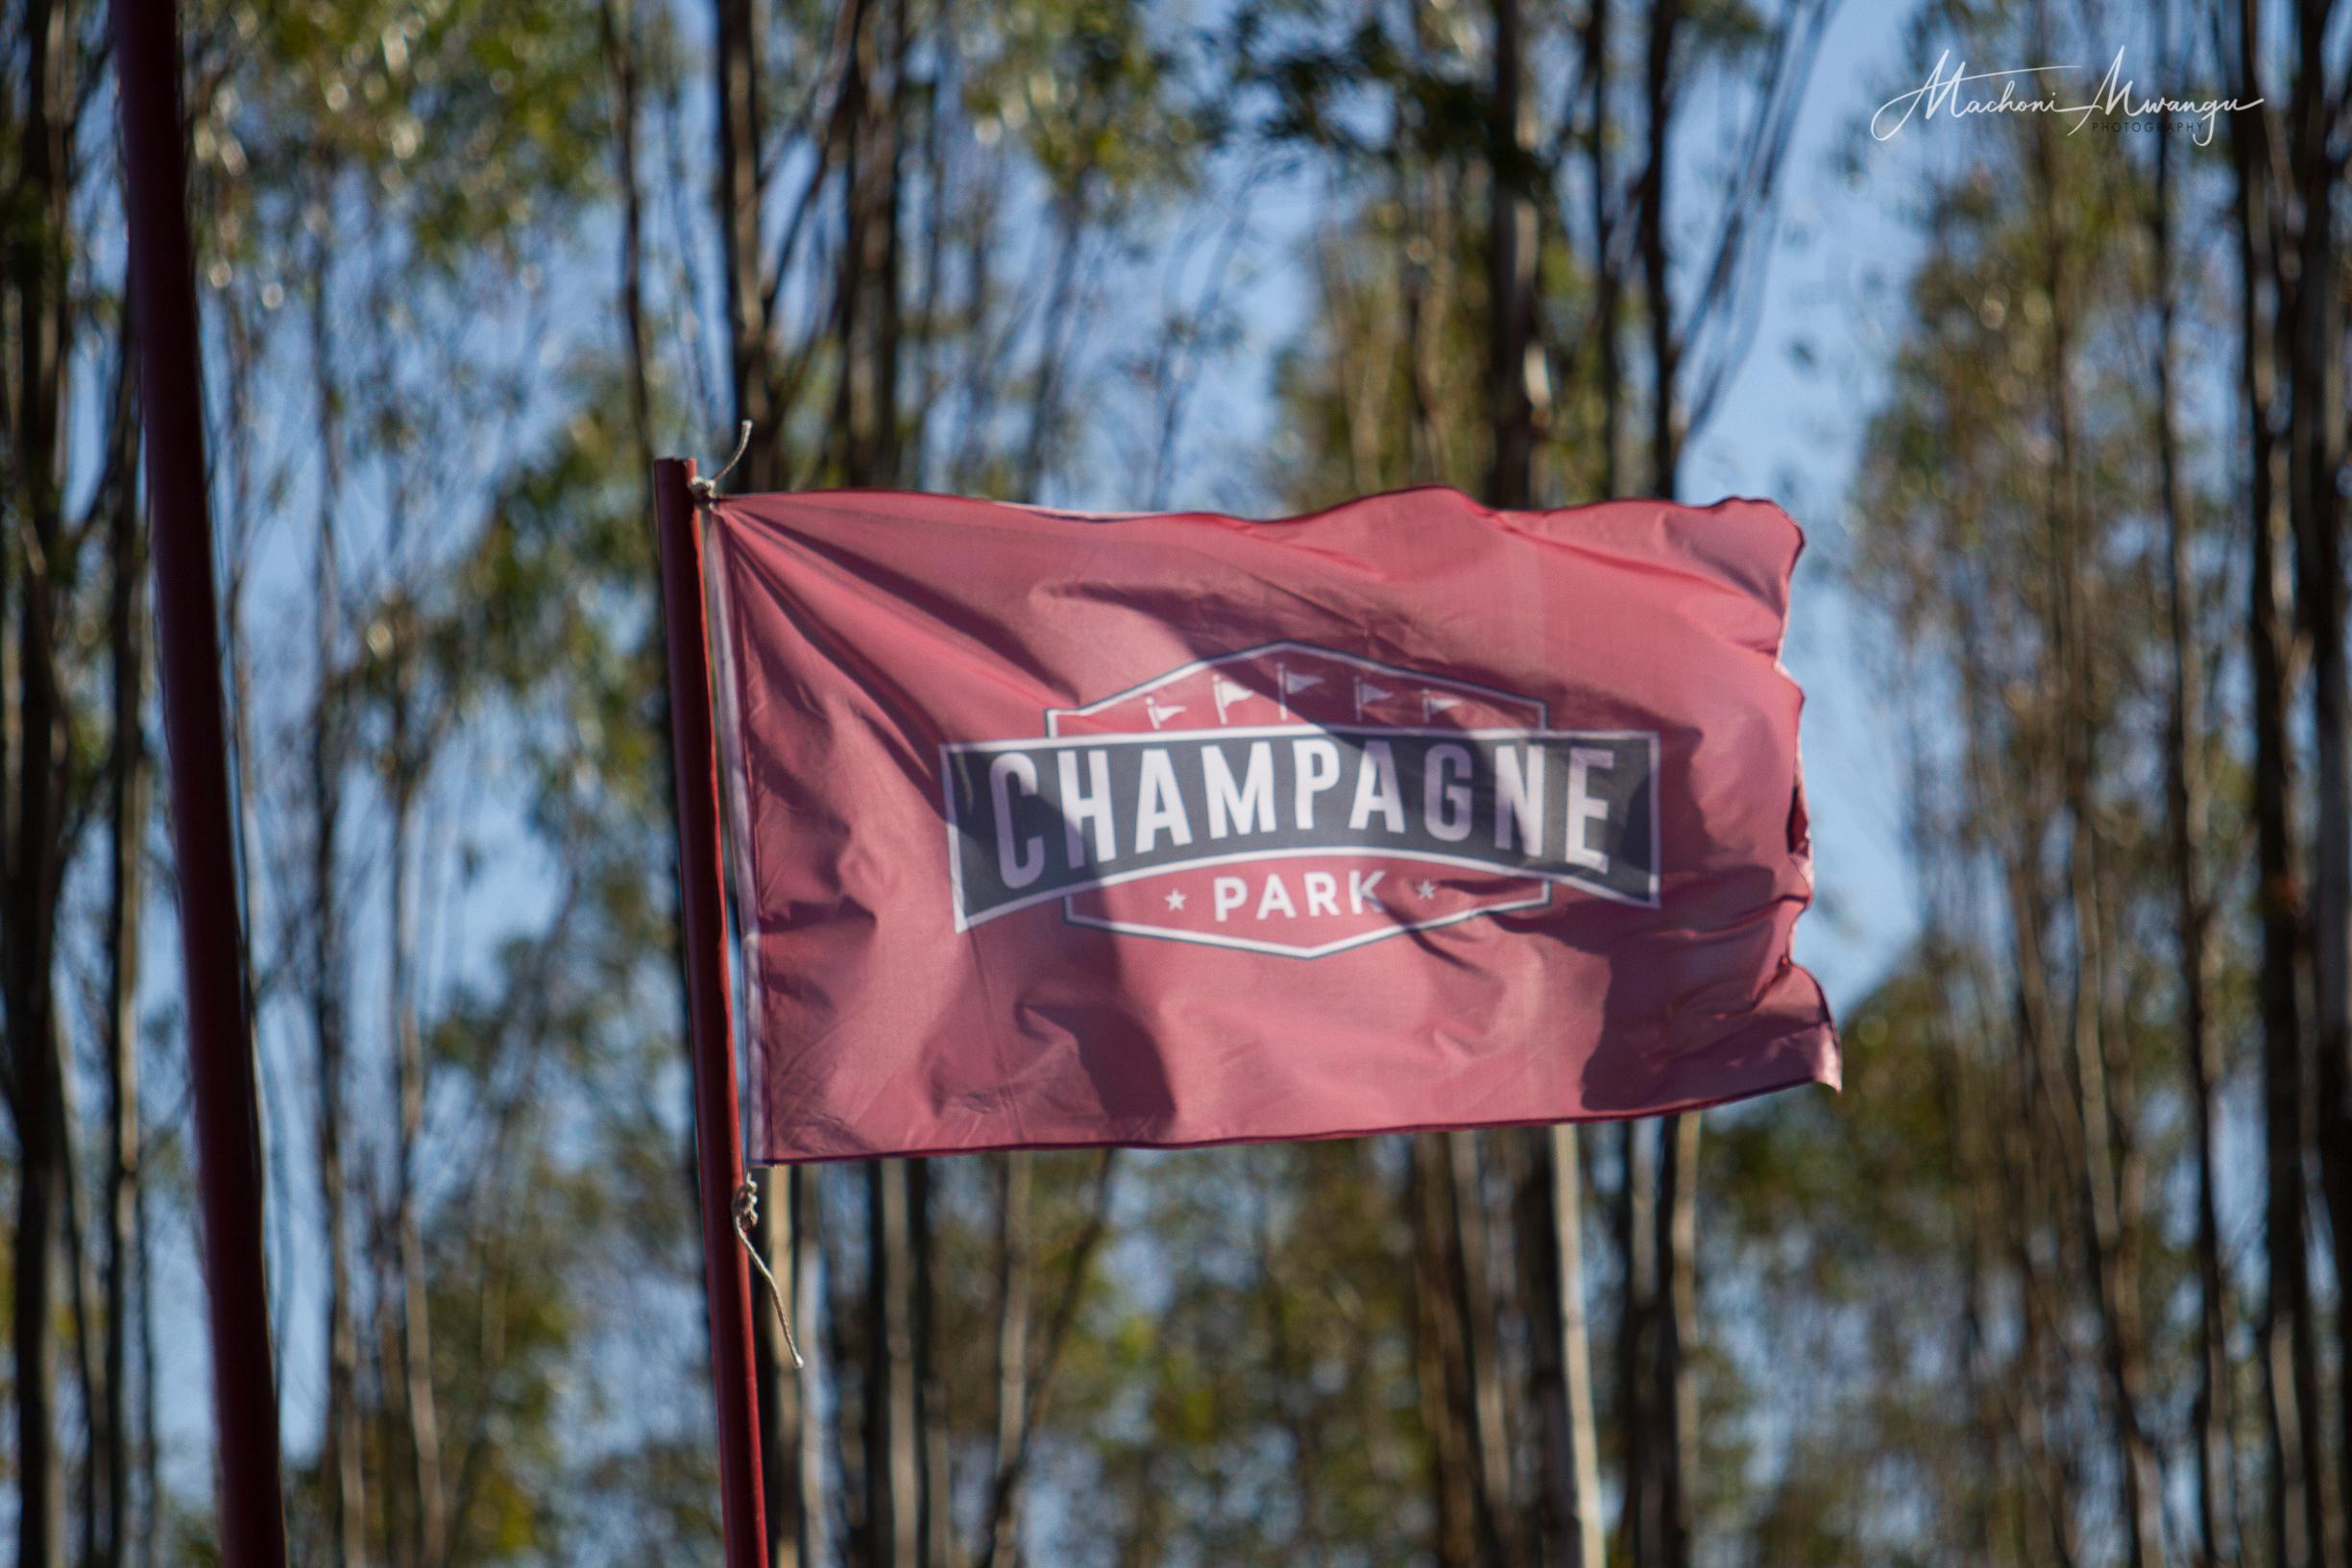 Enduro Championships at Champagne park-1-2.jpg